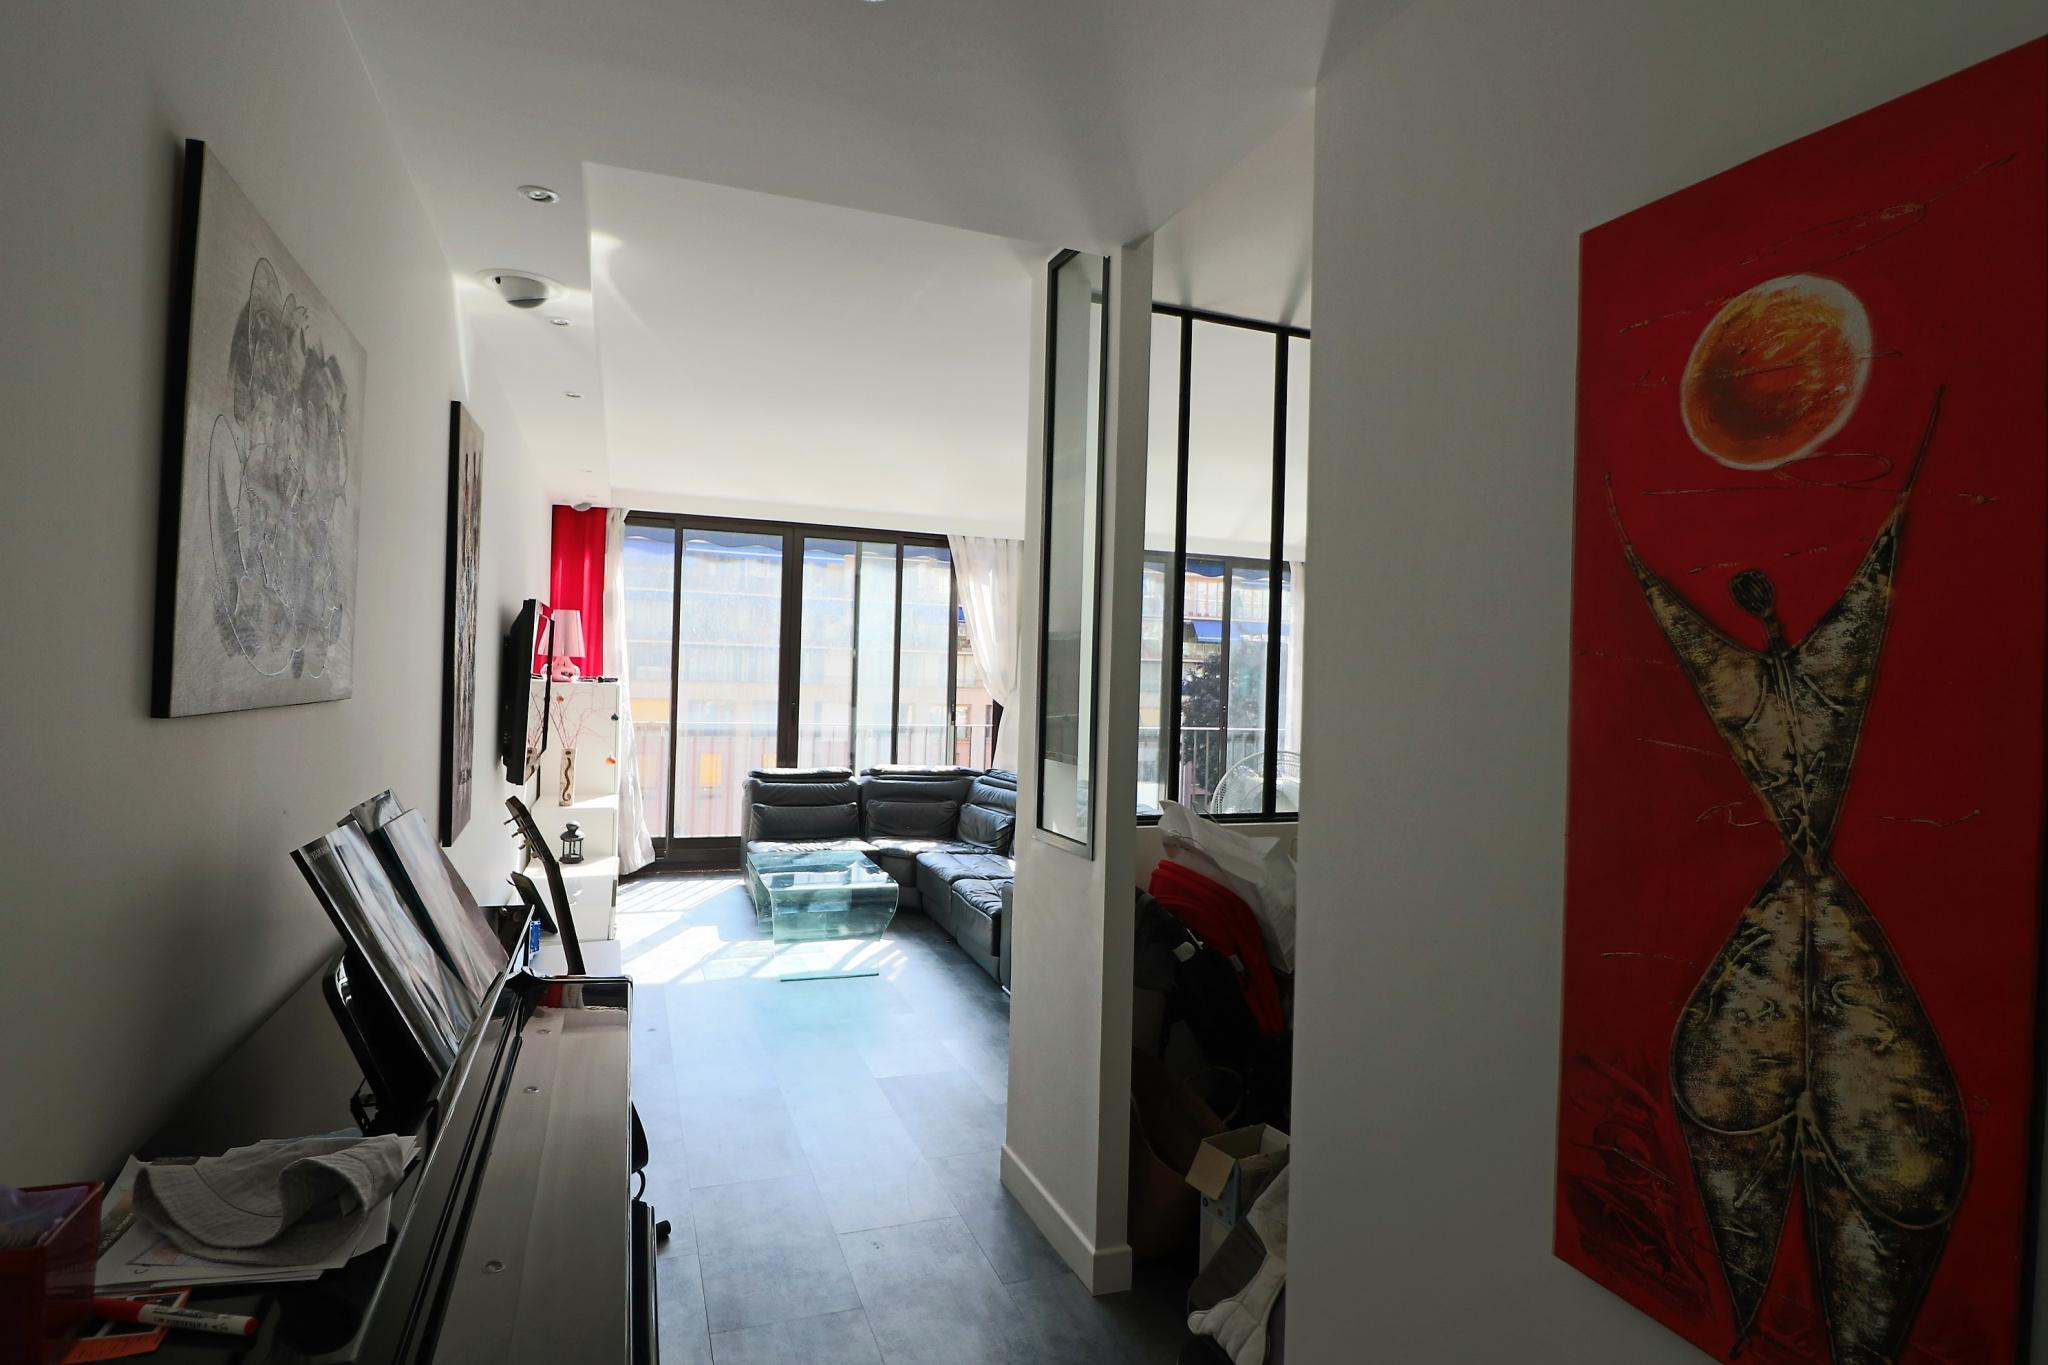 vente chateauvieux conseil. Black Bedroom Furniture Sets. Home Design Ideas